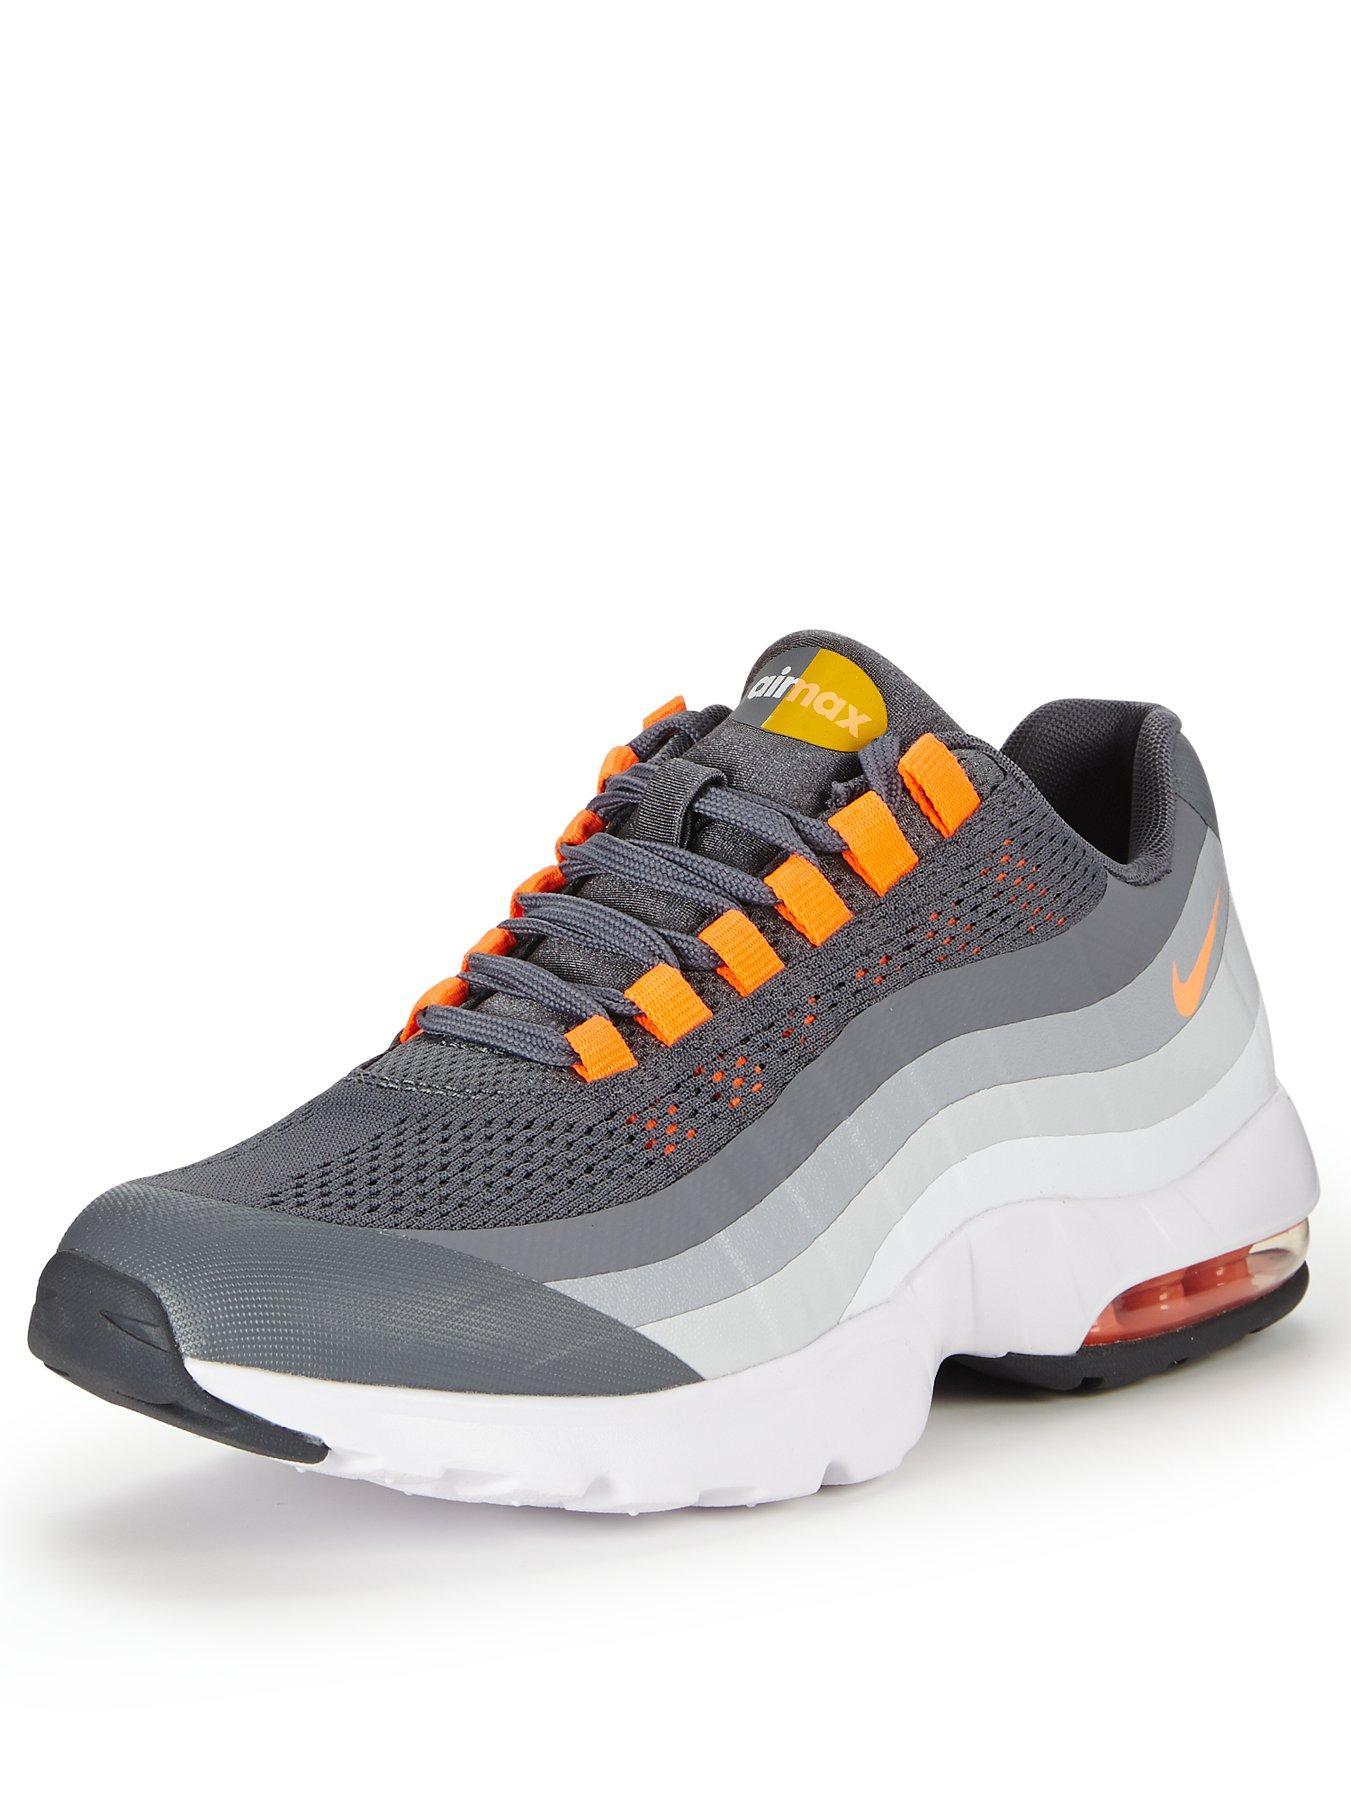 Nike Air Max 95 Ultra Trainers